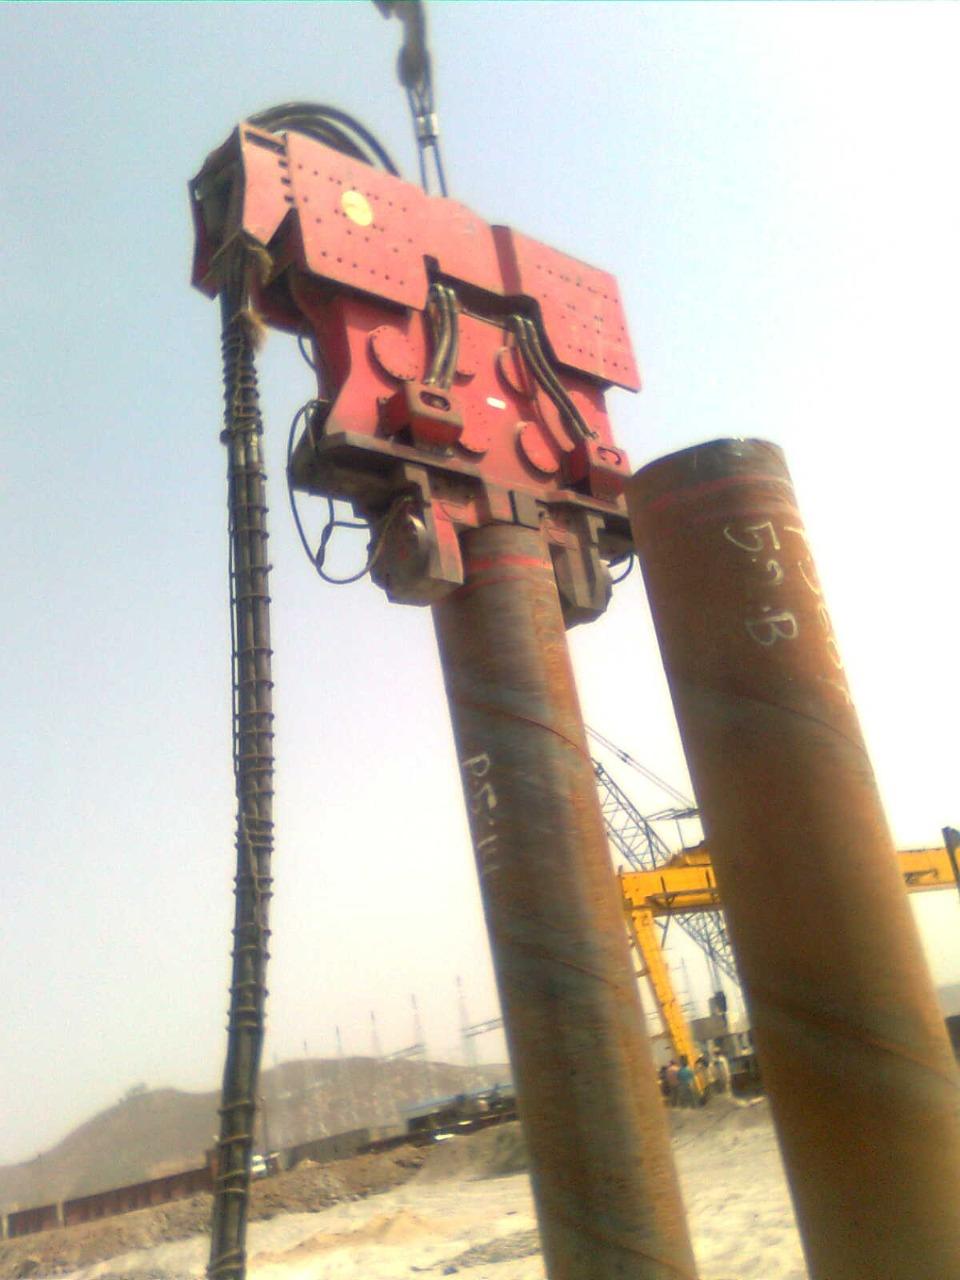 Hydraulic Vibratory Hammer 7-Ton